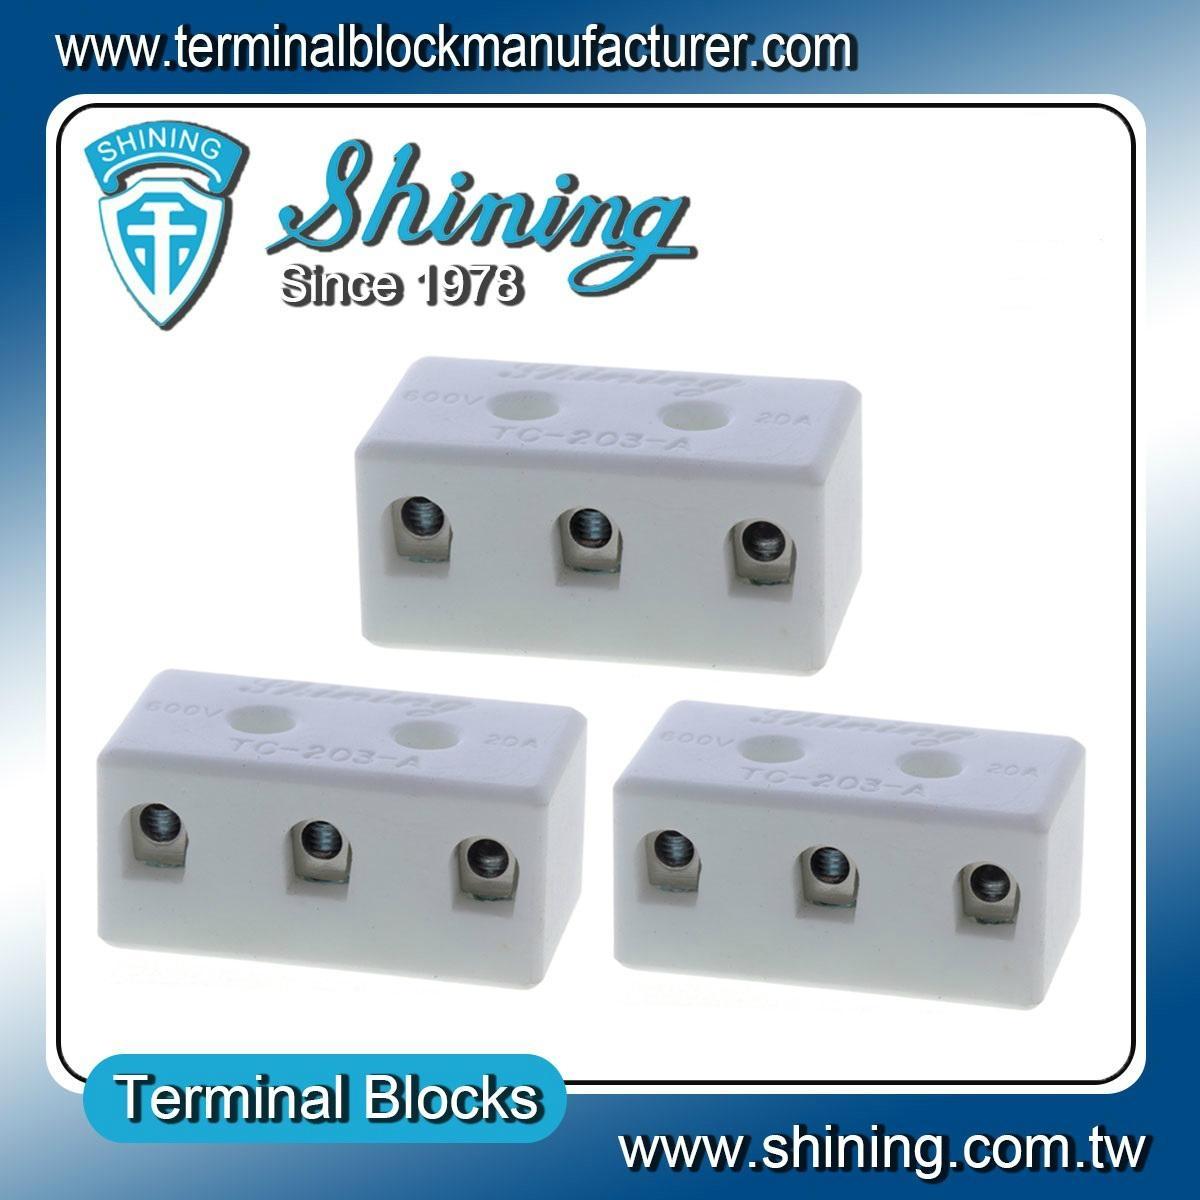 TC-503-A 陶瓷端子台 Ceramic Terminal Block 5